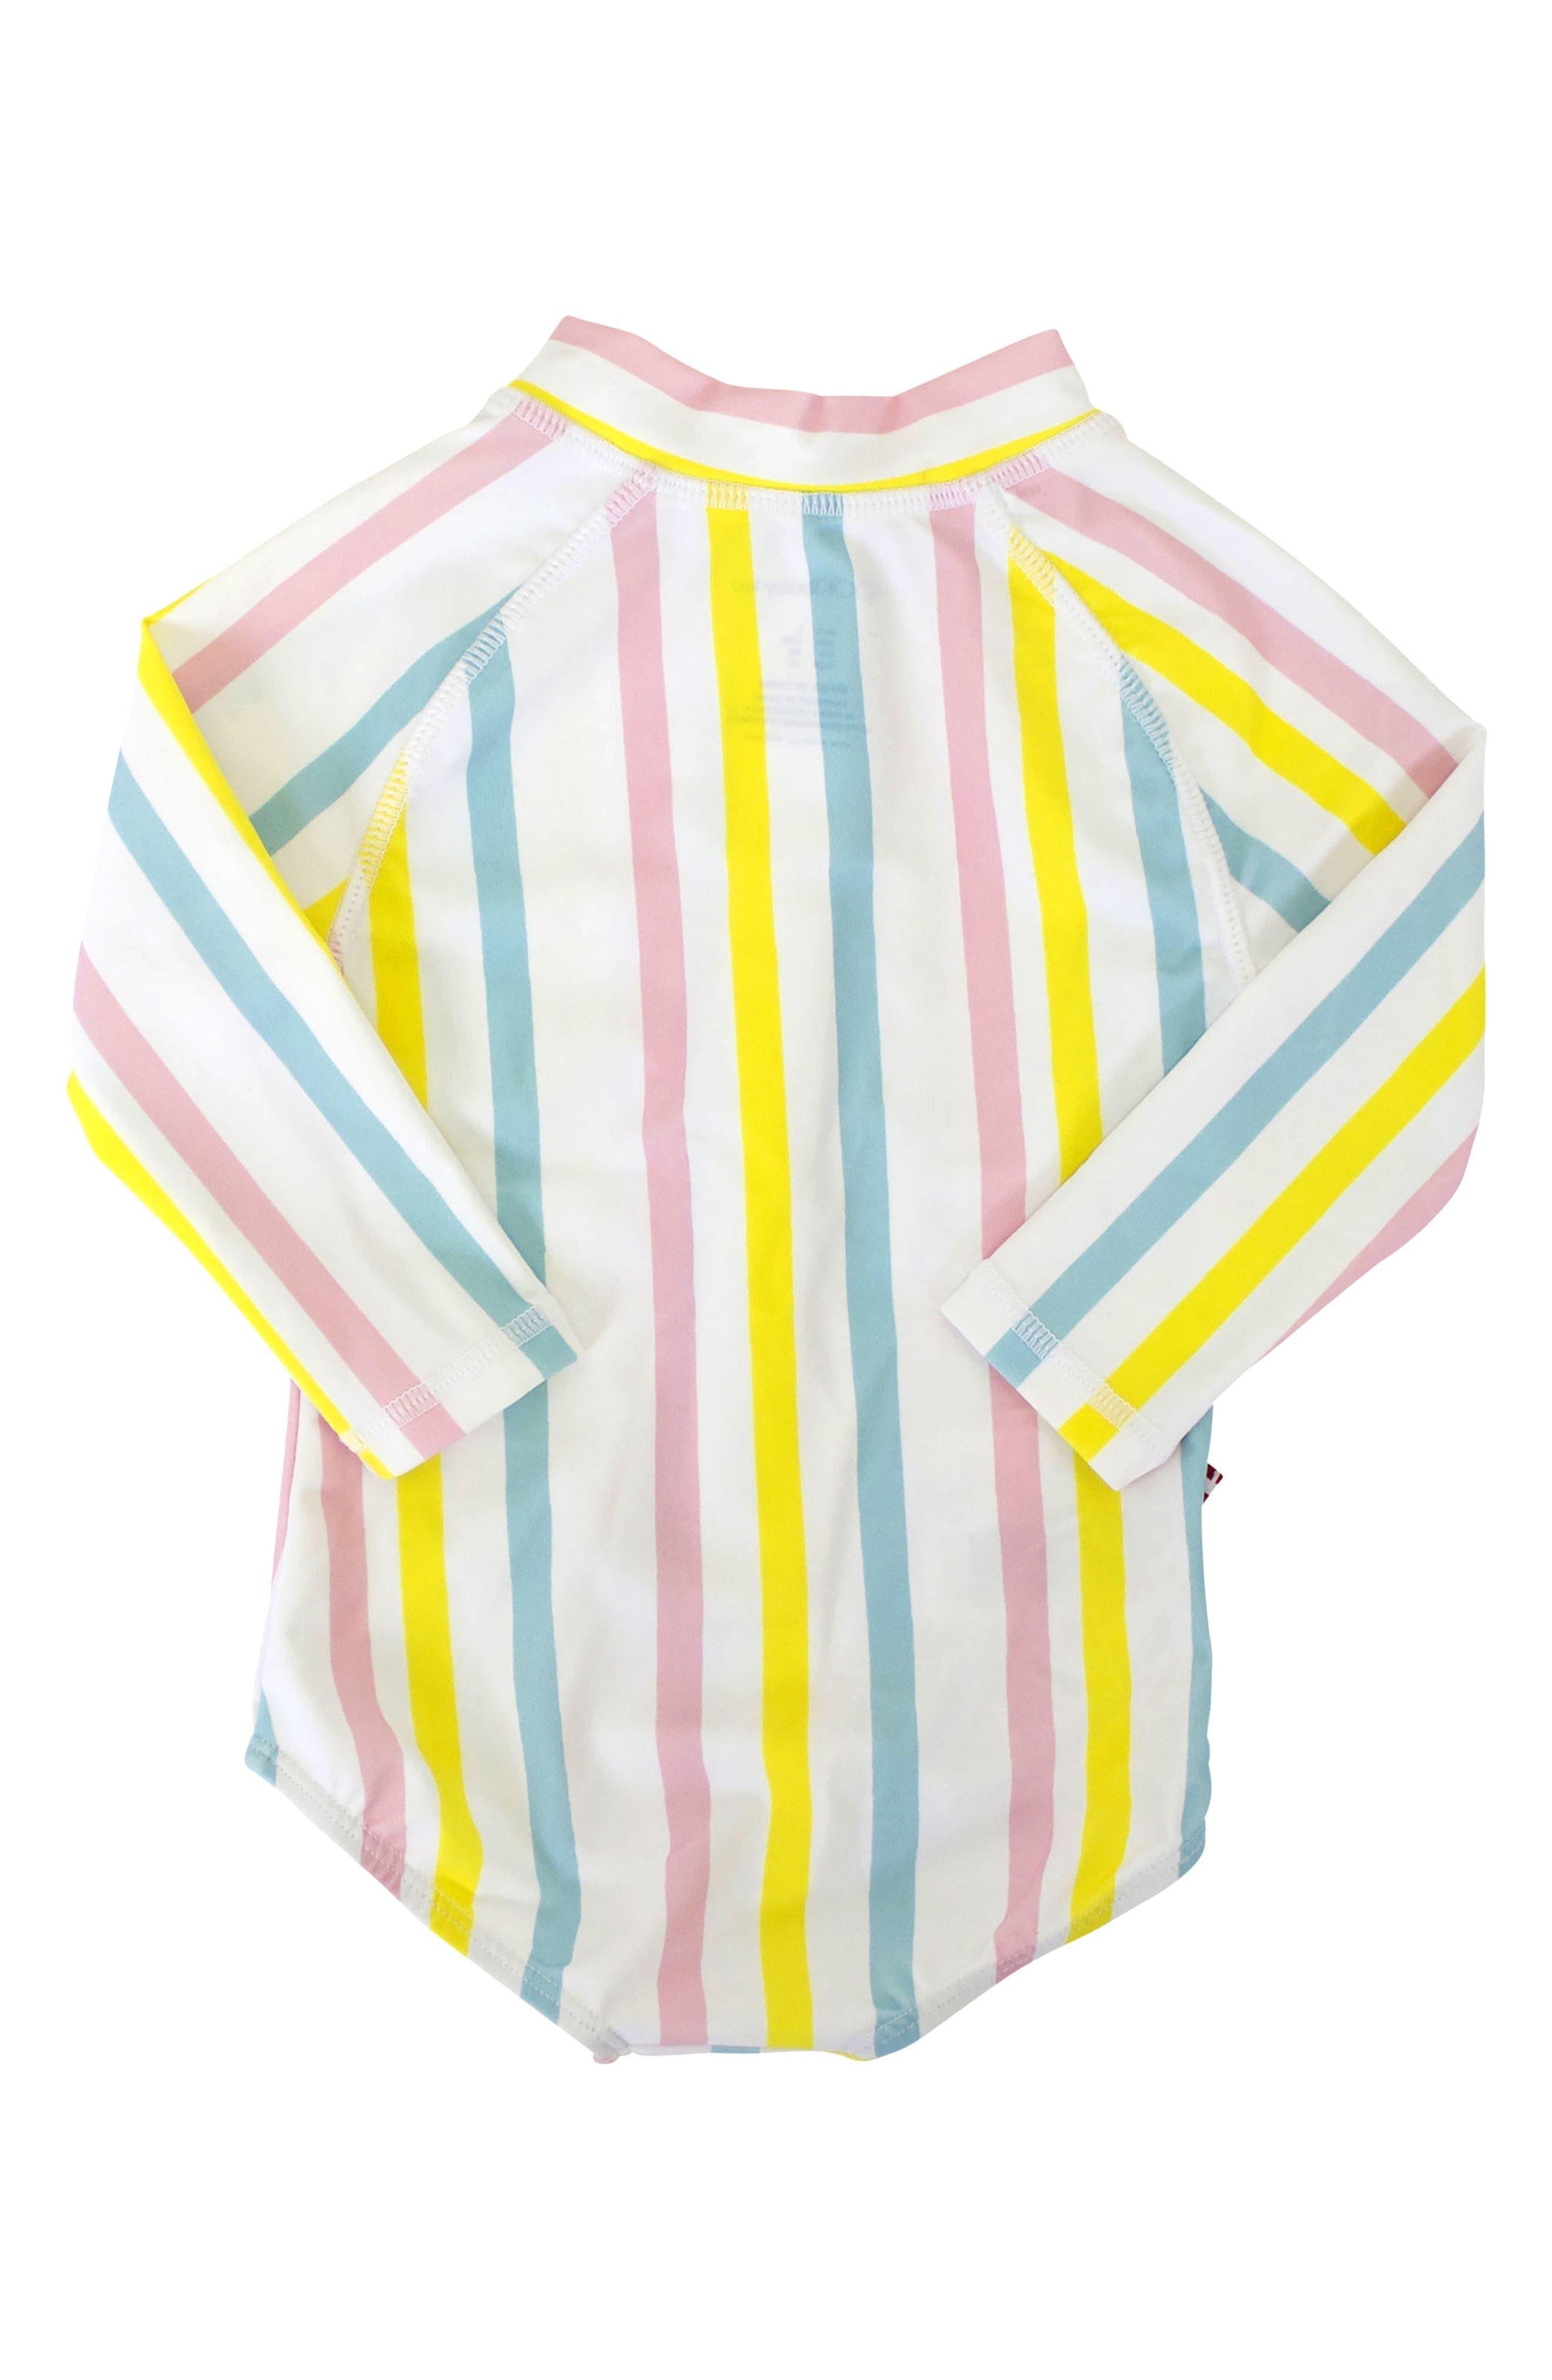 Stripe One-Piece Rashguard Swimsuit,                             Alternate thumbnail 2, color,                             Yellow Multi